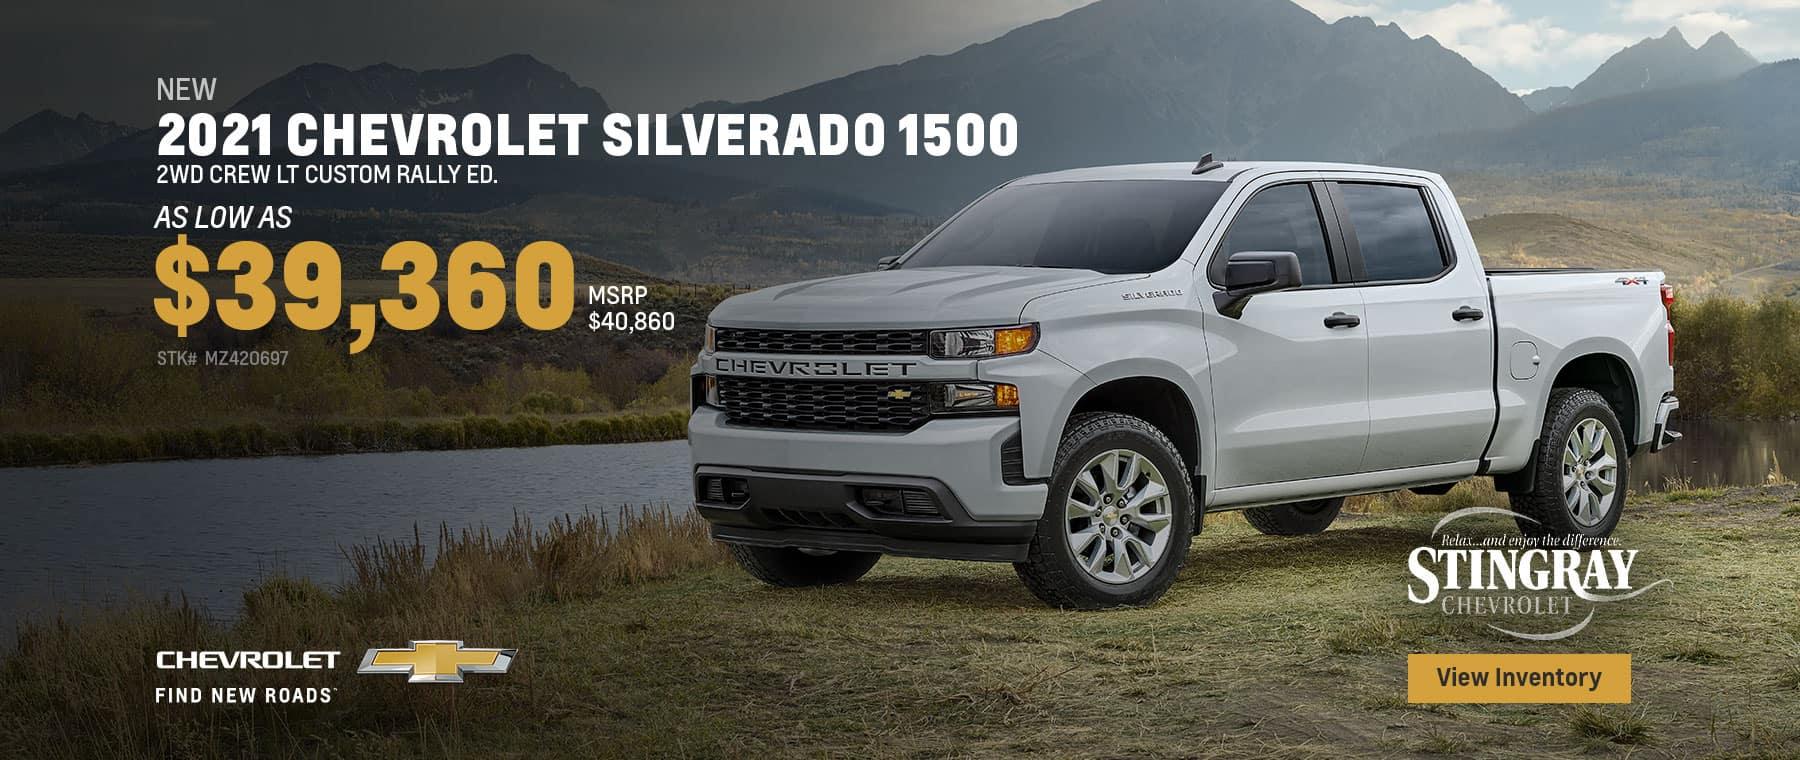 Slider_1800x760-Silverado